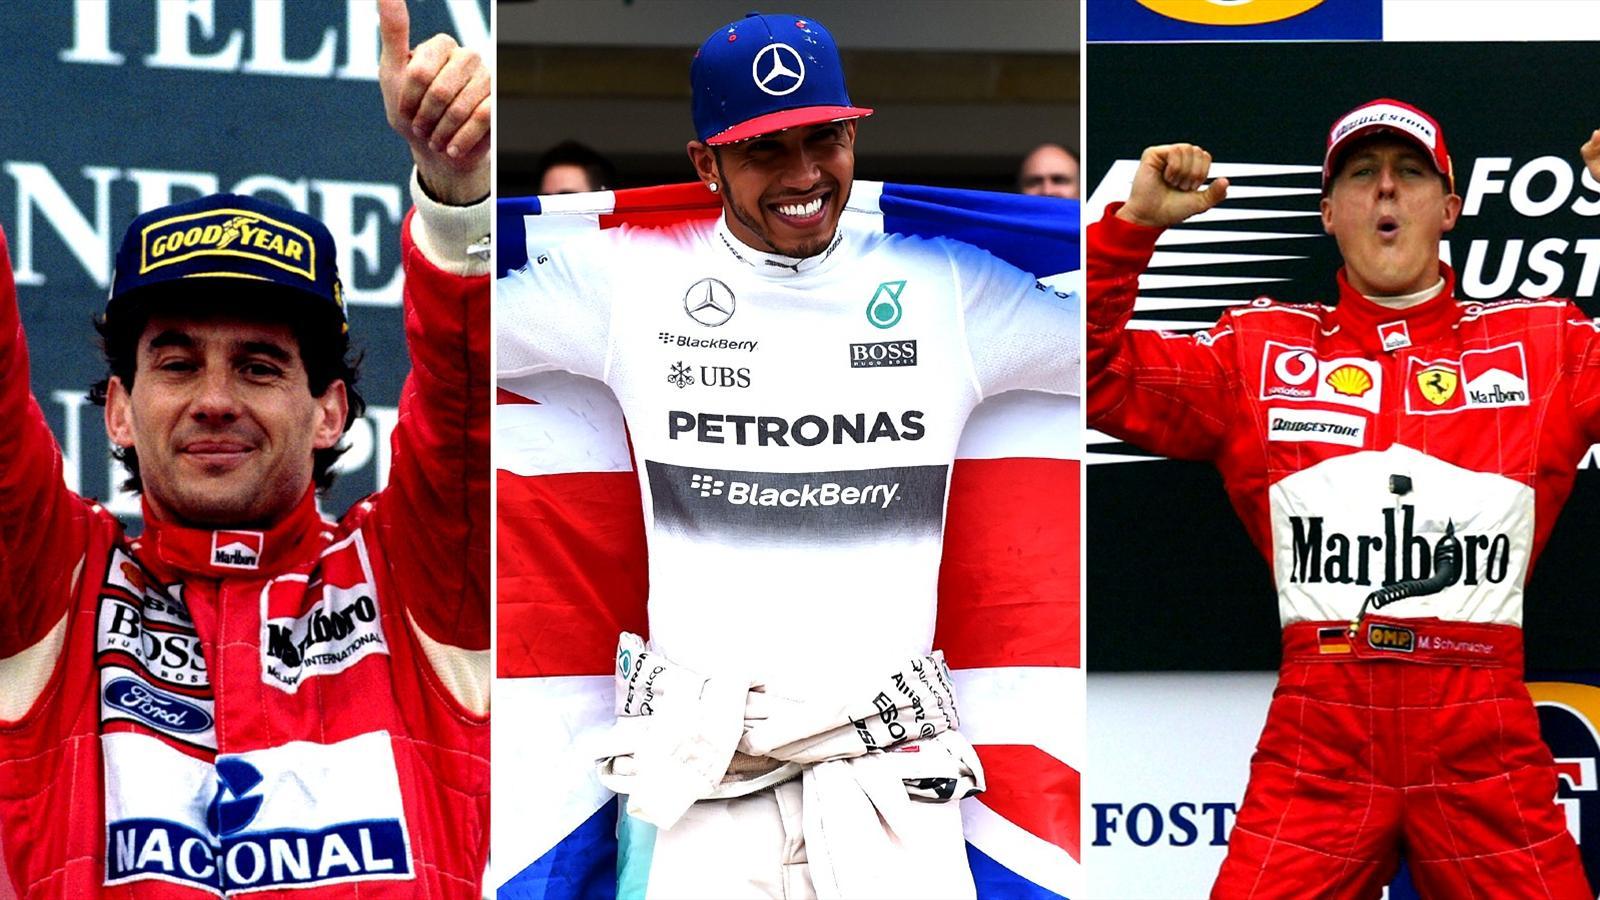 Ayrton Senna, Lewis Hamilton and Michael Schumacher